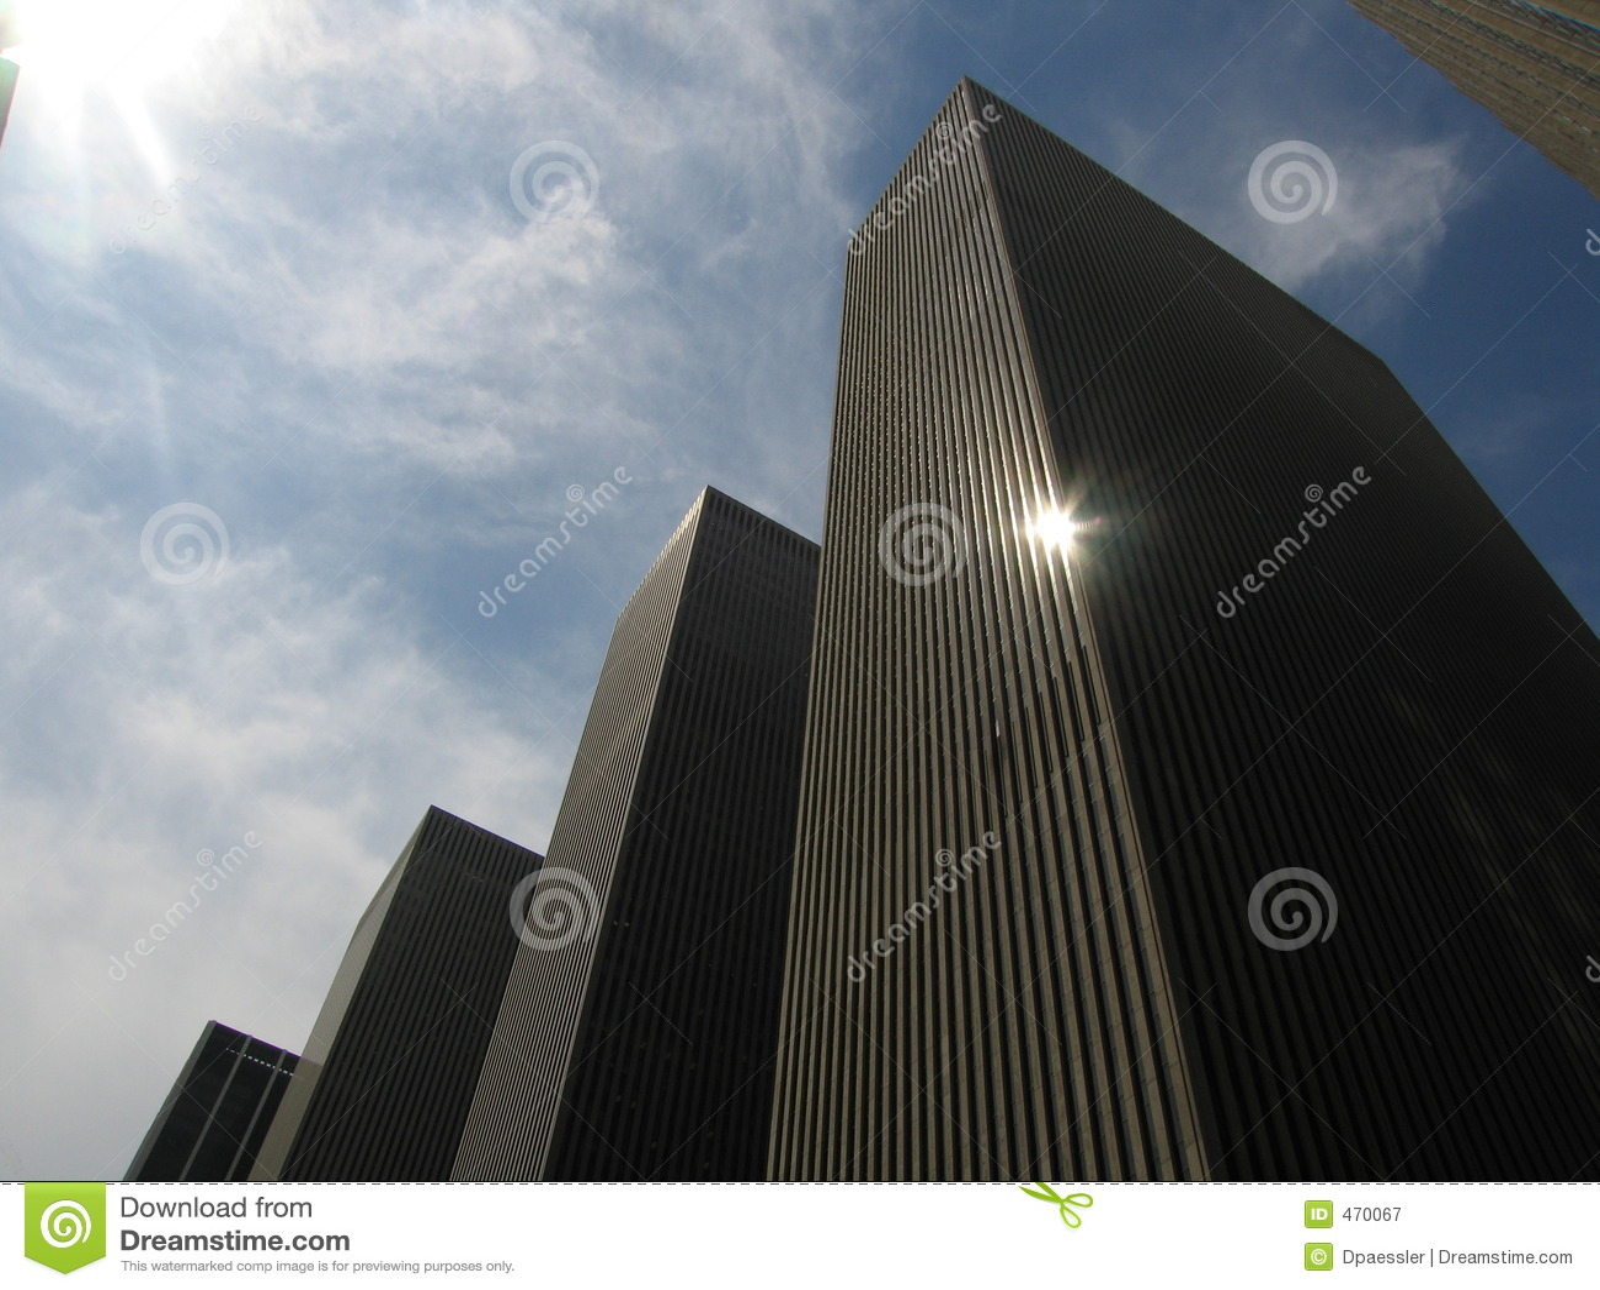 Façades de gratte-ciel